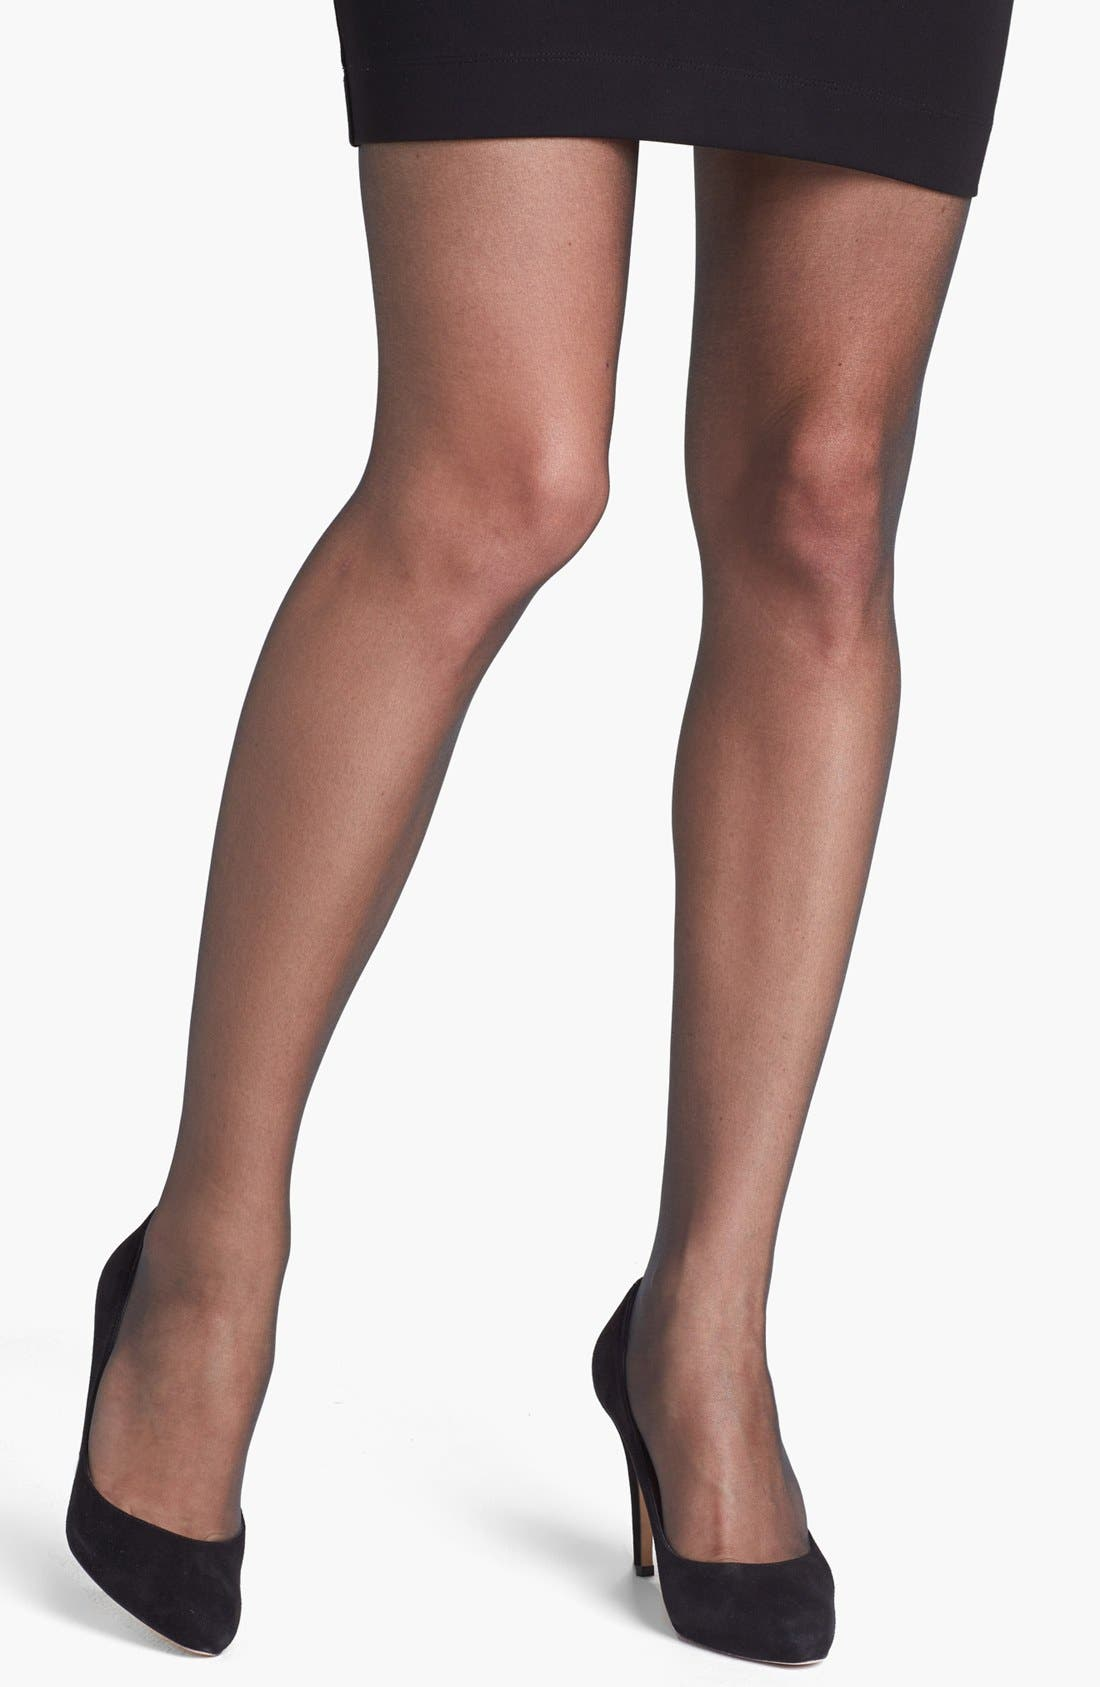 Alternate Image 1 Selected - Calvin Klein 'Infinite Sheer' Control Top Pantyhose